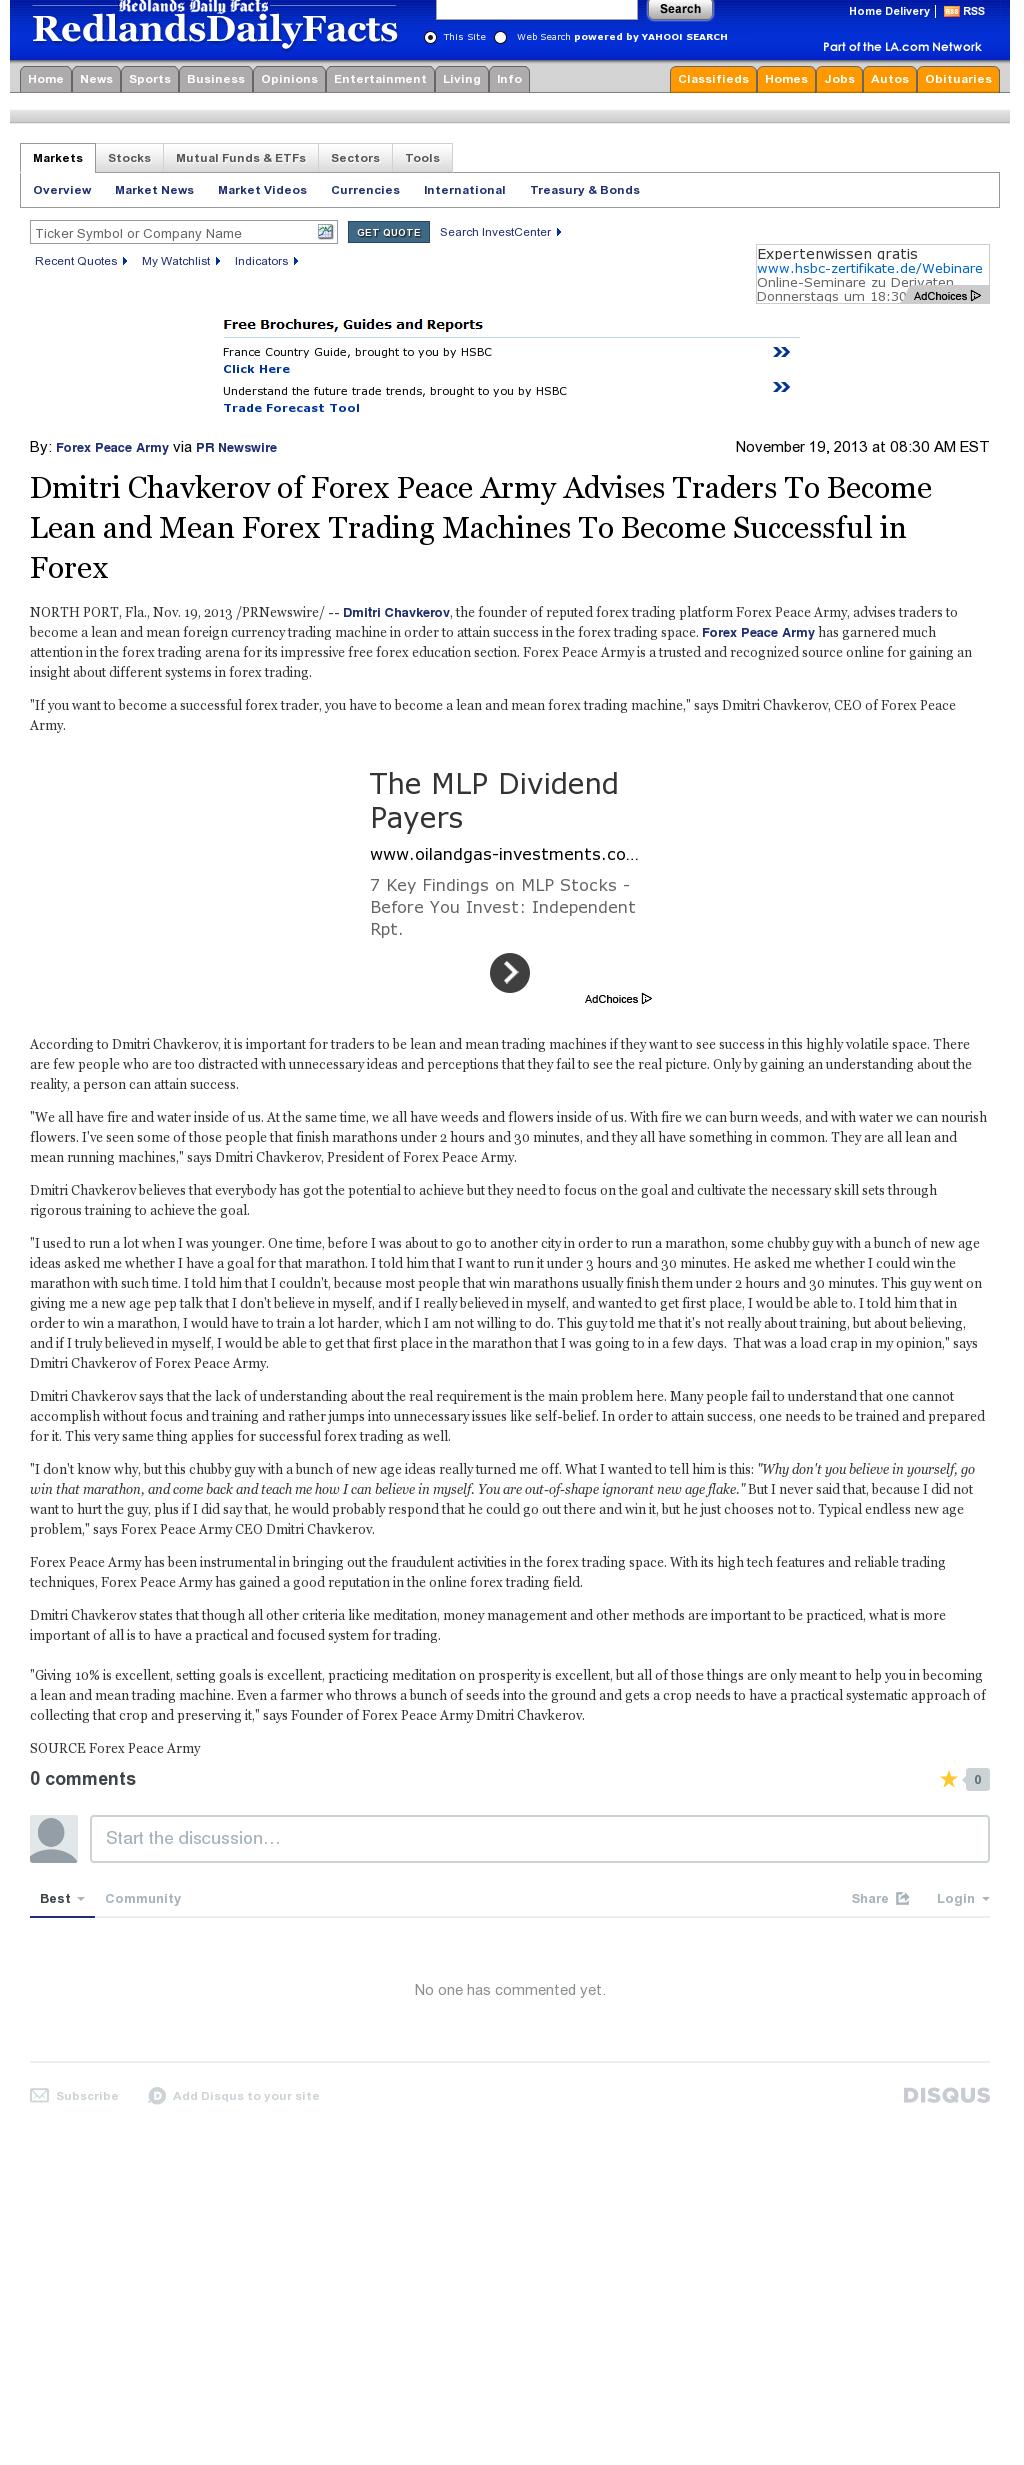 Dmitri Chavkerov - Redlands Daily Facts (Redlands, CA) - Lean Forex Trading